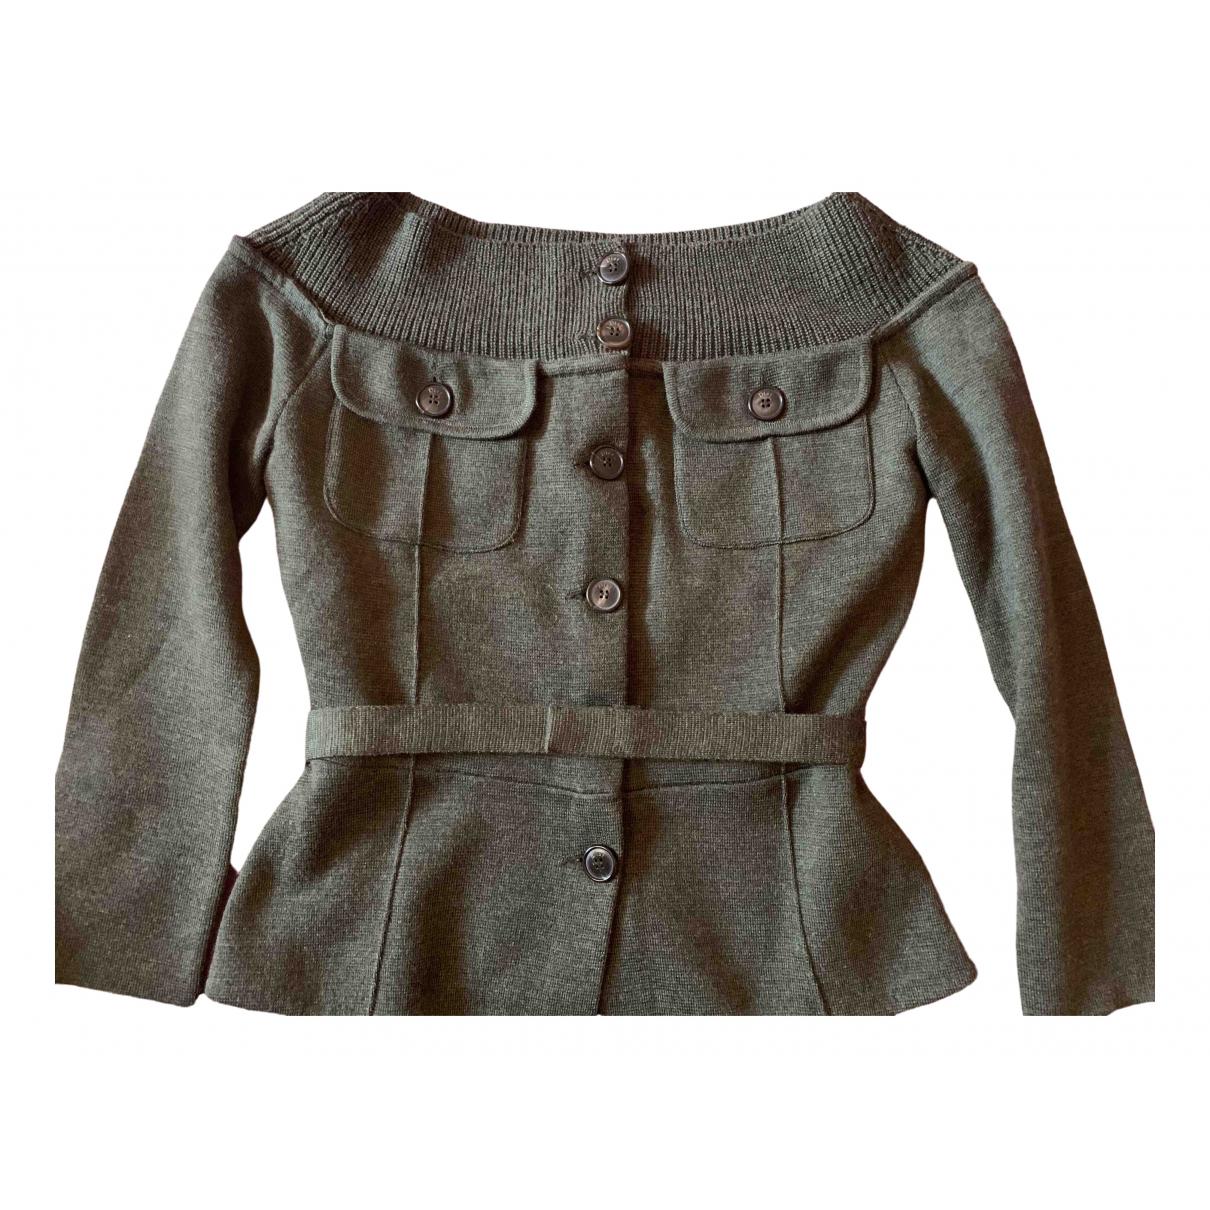 Dior \N Green Wool jacket for Women 44 IT